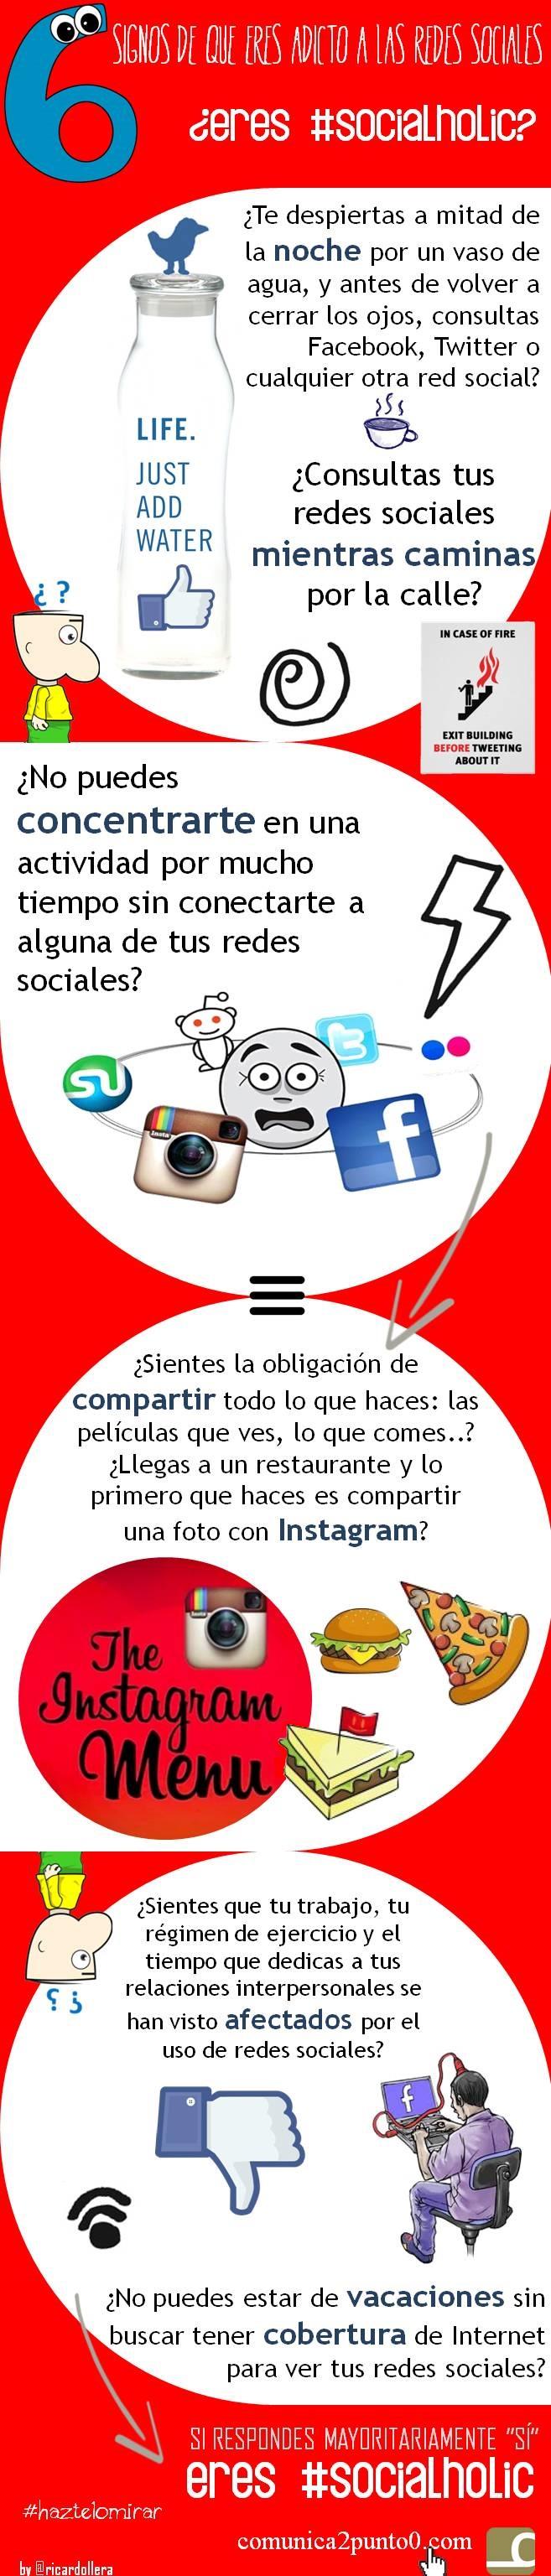 socialholic_infografia